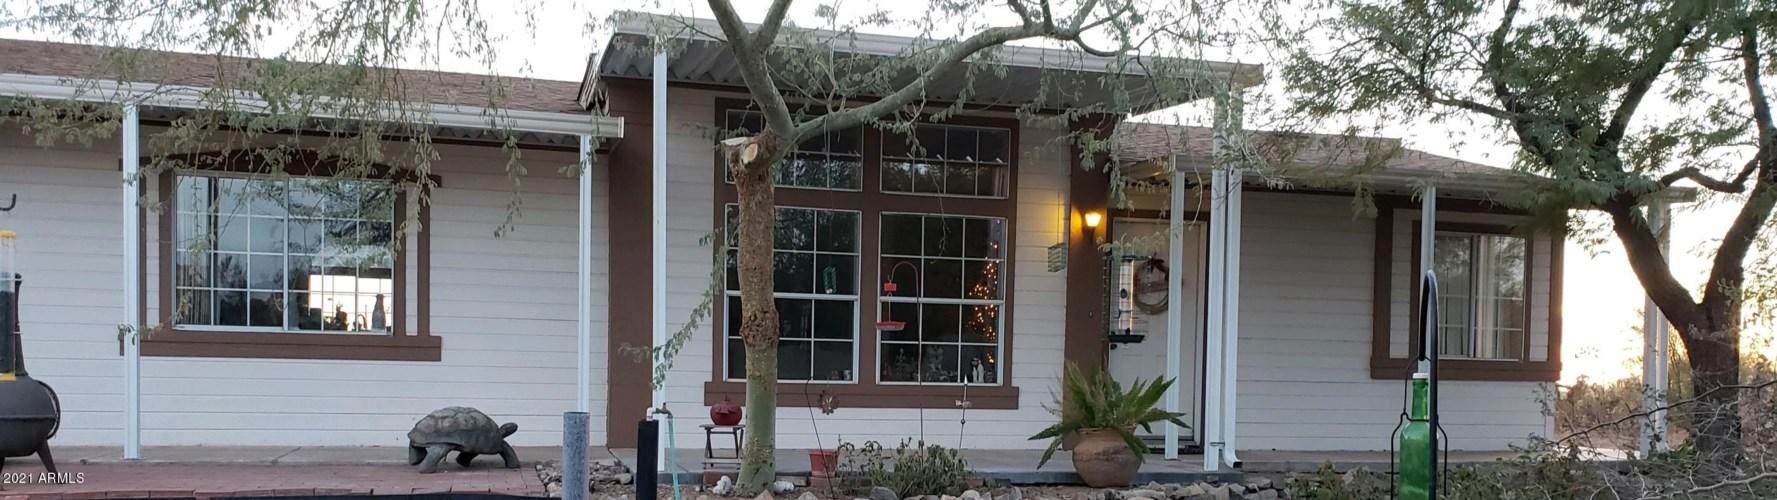 1743 N SAN MARCOS Drive, Apache Junction, AZ 85120